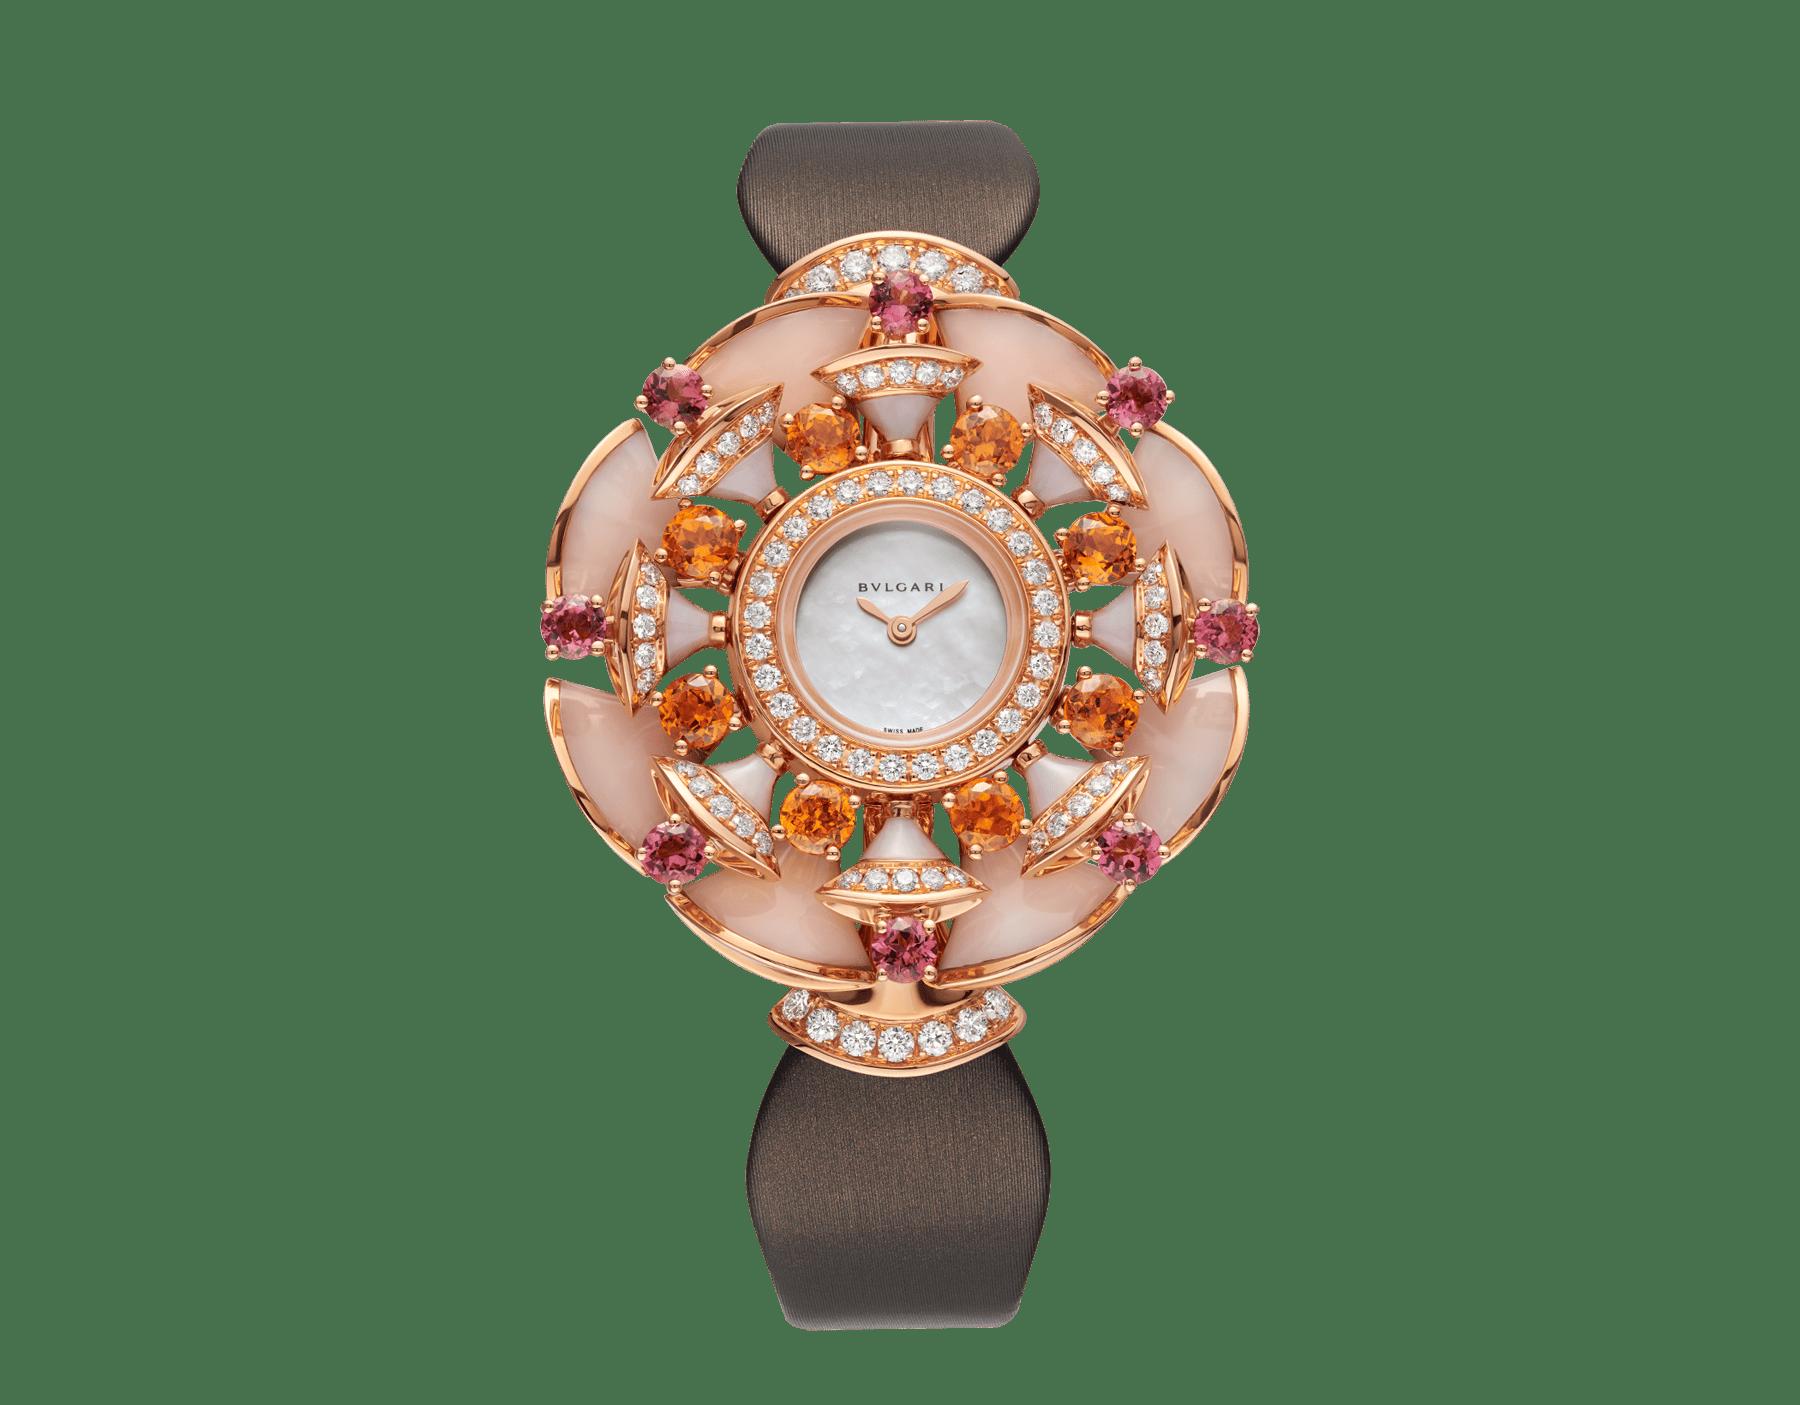 DIVAS' DREAM 腕錶,18K 玫瑰金錶殼鑲飾明亮型切割鑽石、橙色石榴石、碧璽和粉紅色蛋白石元素。白色珍珠母貝錶盤,褐灰色緞面錶帶。 102420 image 1